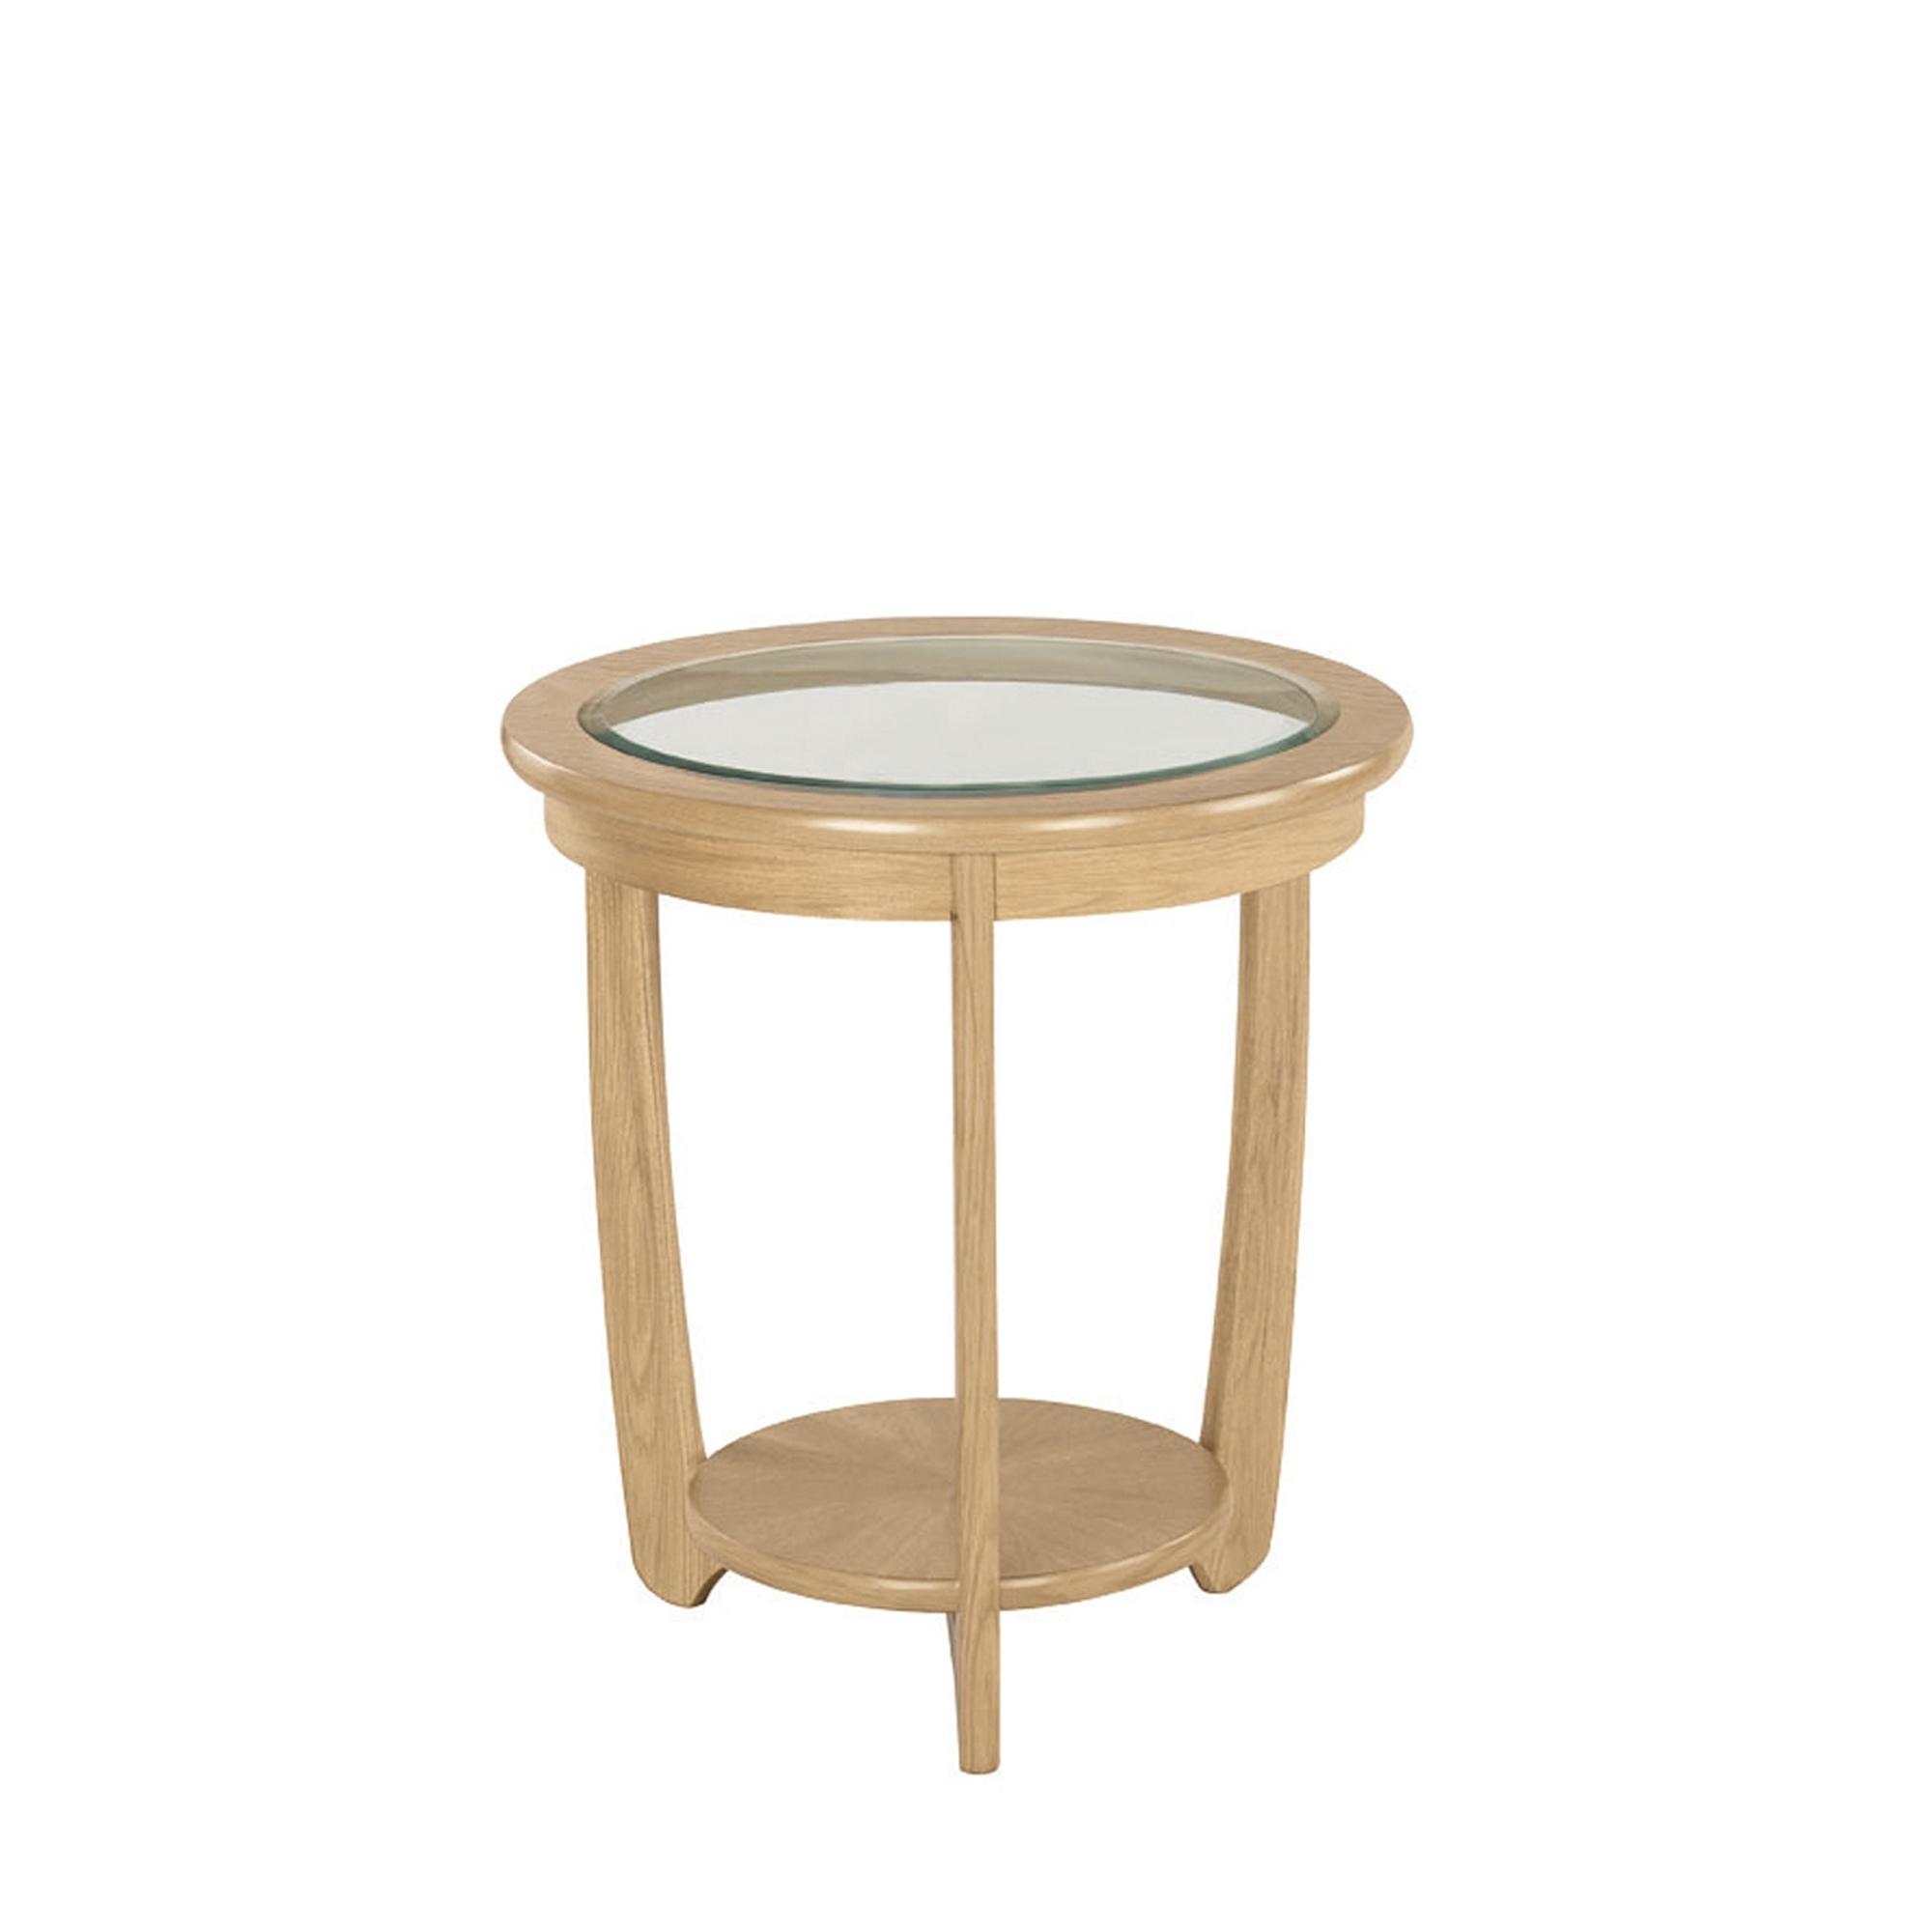 Nathan shades oak glass top round lamp table side tables cookes nathan shades oak glass top round lamp table aloadofball Choice Image